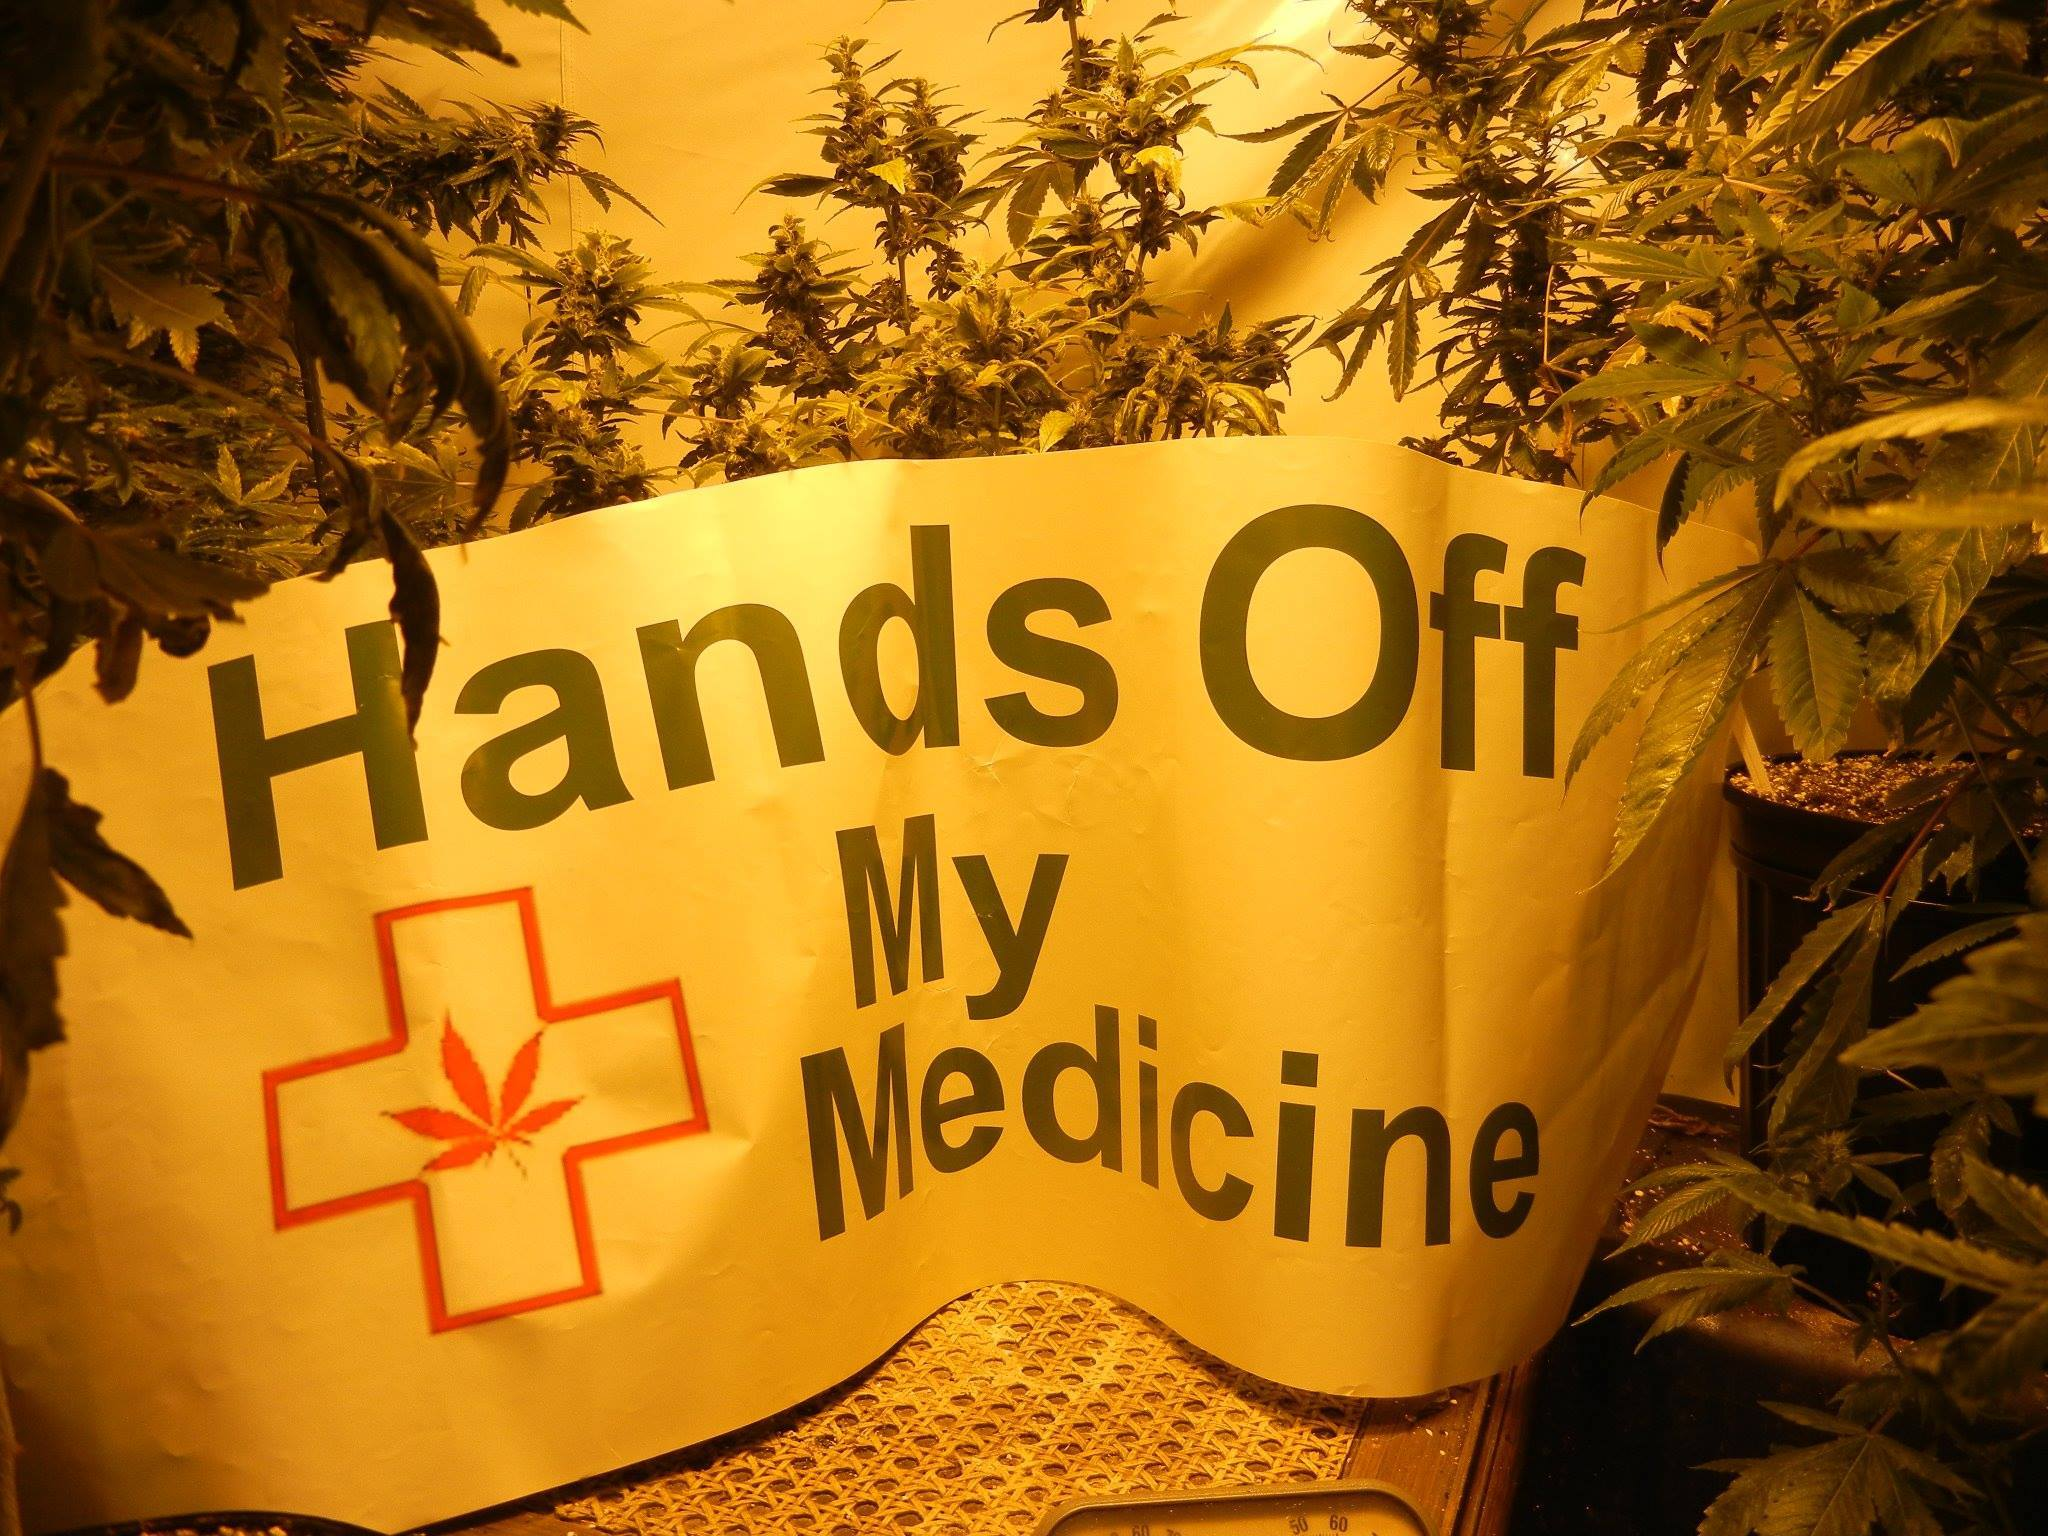 Michigan Medical Marijuana Caregivers & Patients - Index page